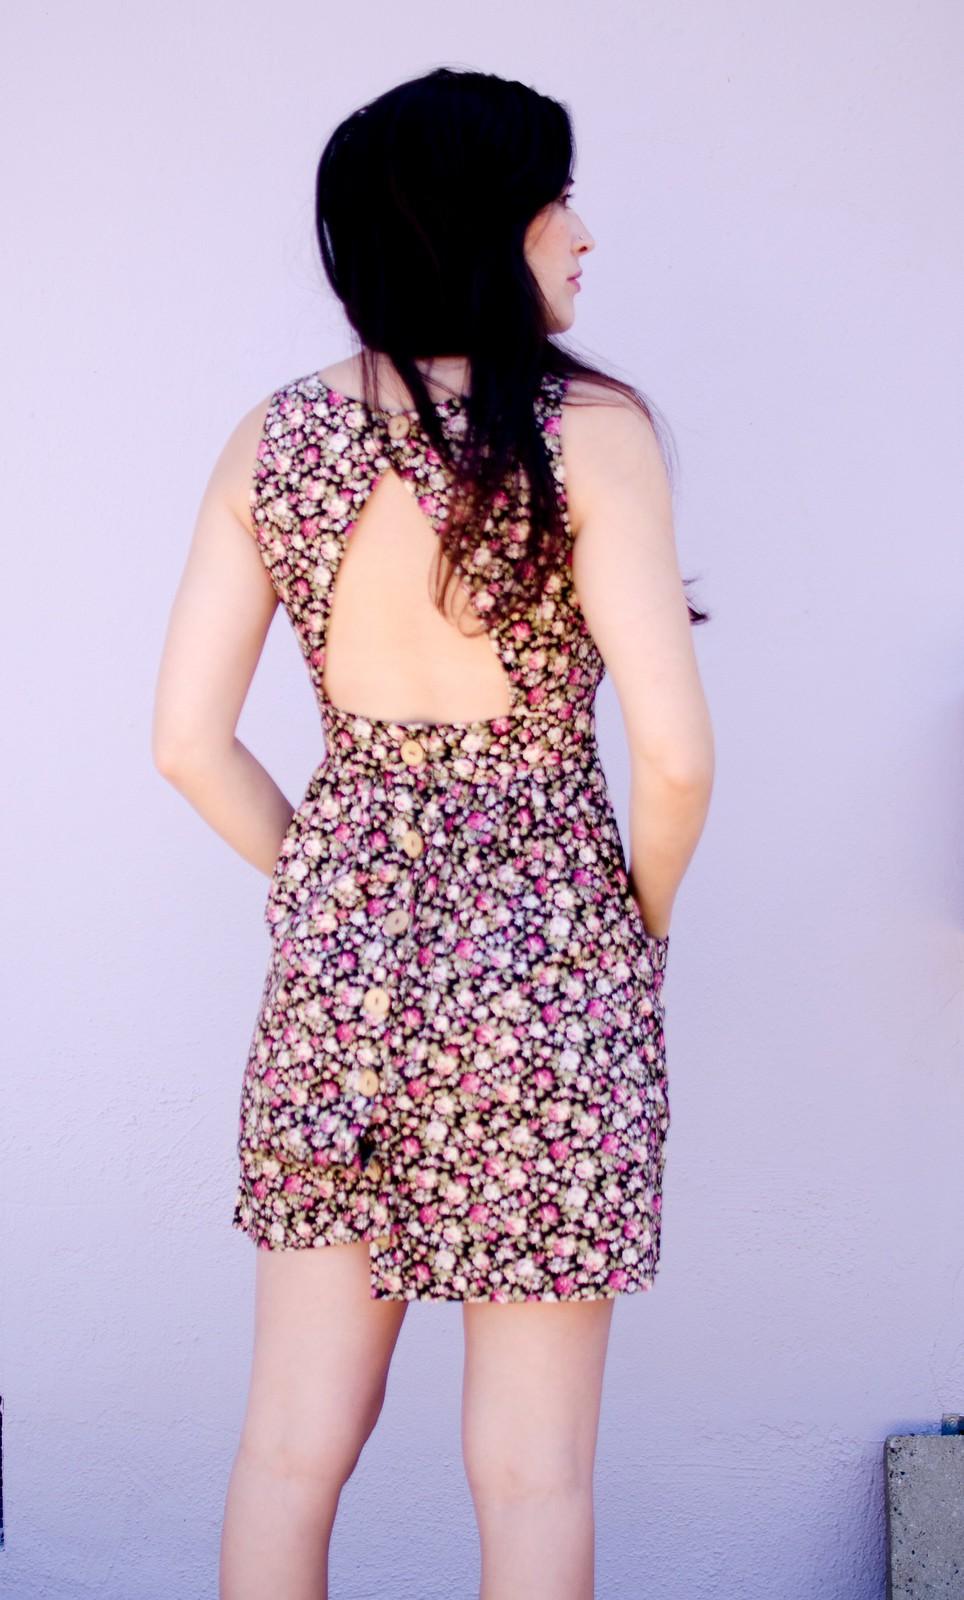 Copying RTW - F21 dress